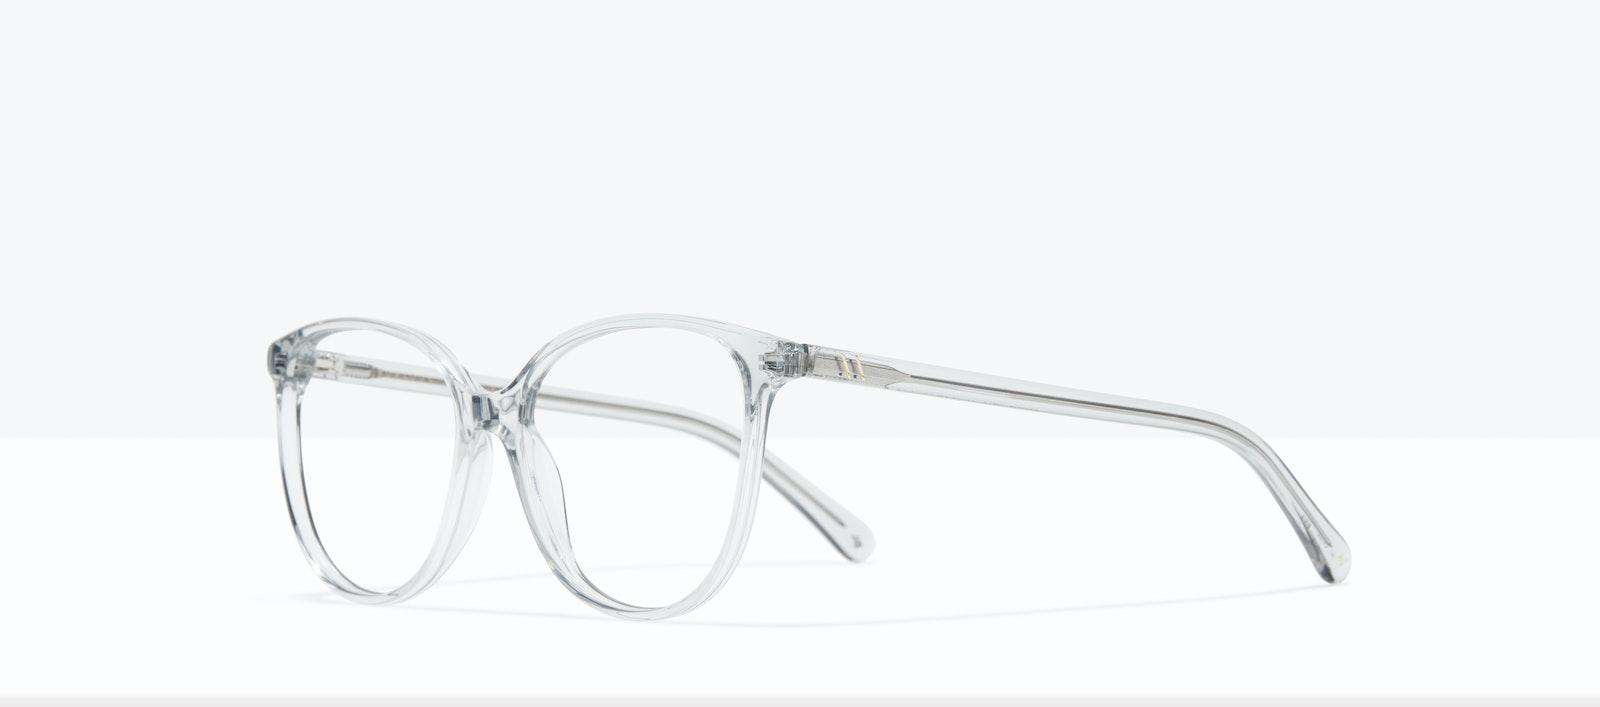 Affordable Fashion Glasses Cat Eye Eyeglasses Women Imagine XS Taupe Tilt